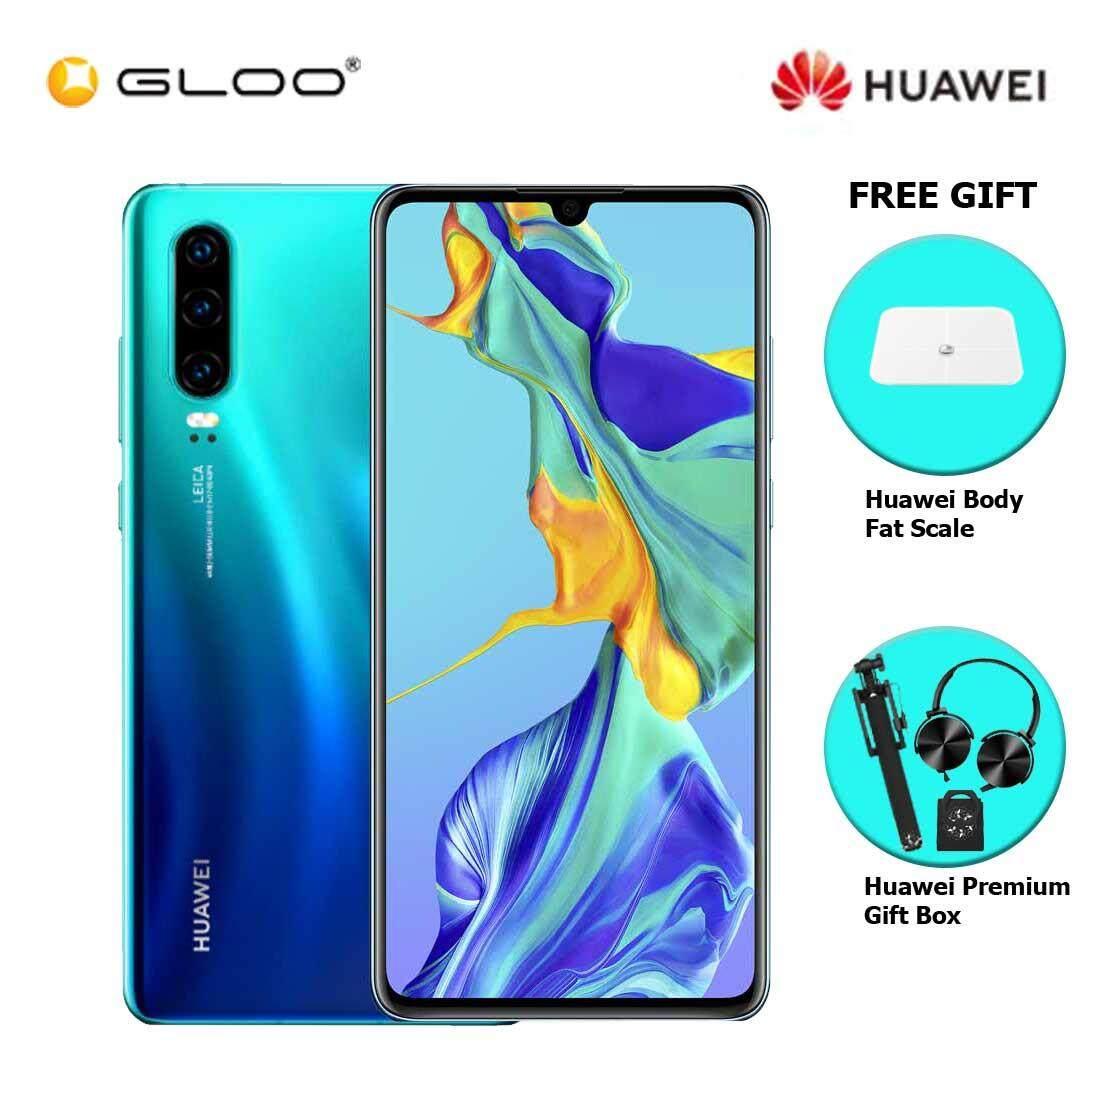 Huawei P30 8GB+128GB Aurora + FREE Huawei Body Fat Scale 6901443198375,Premium Gift Box (Headset/Selfie Stick/iRing)